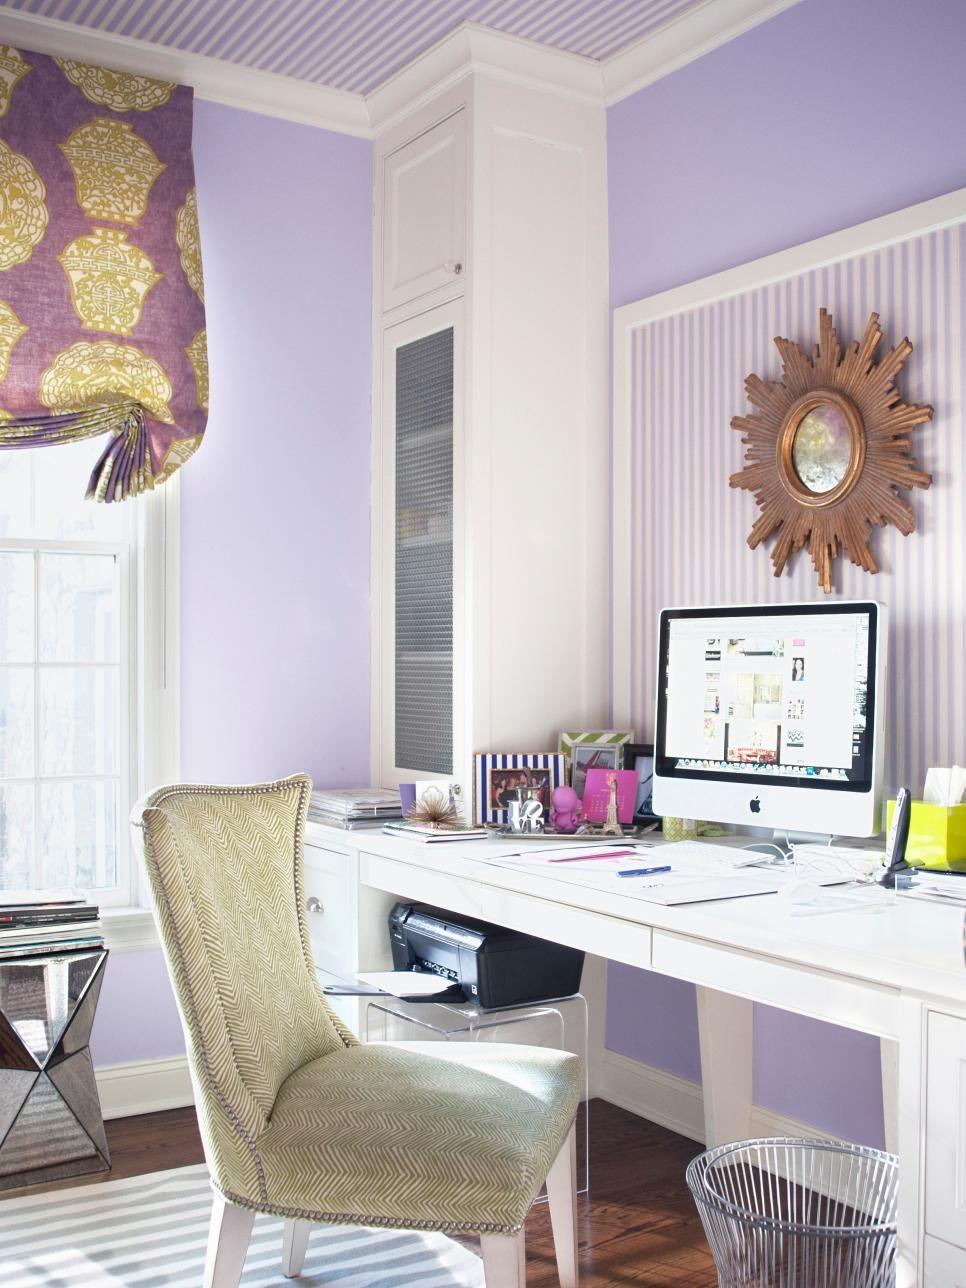 Family-Friendly Home Decorating Ideas | Hgtv magazine, Room kitchen ...